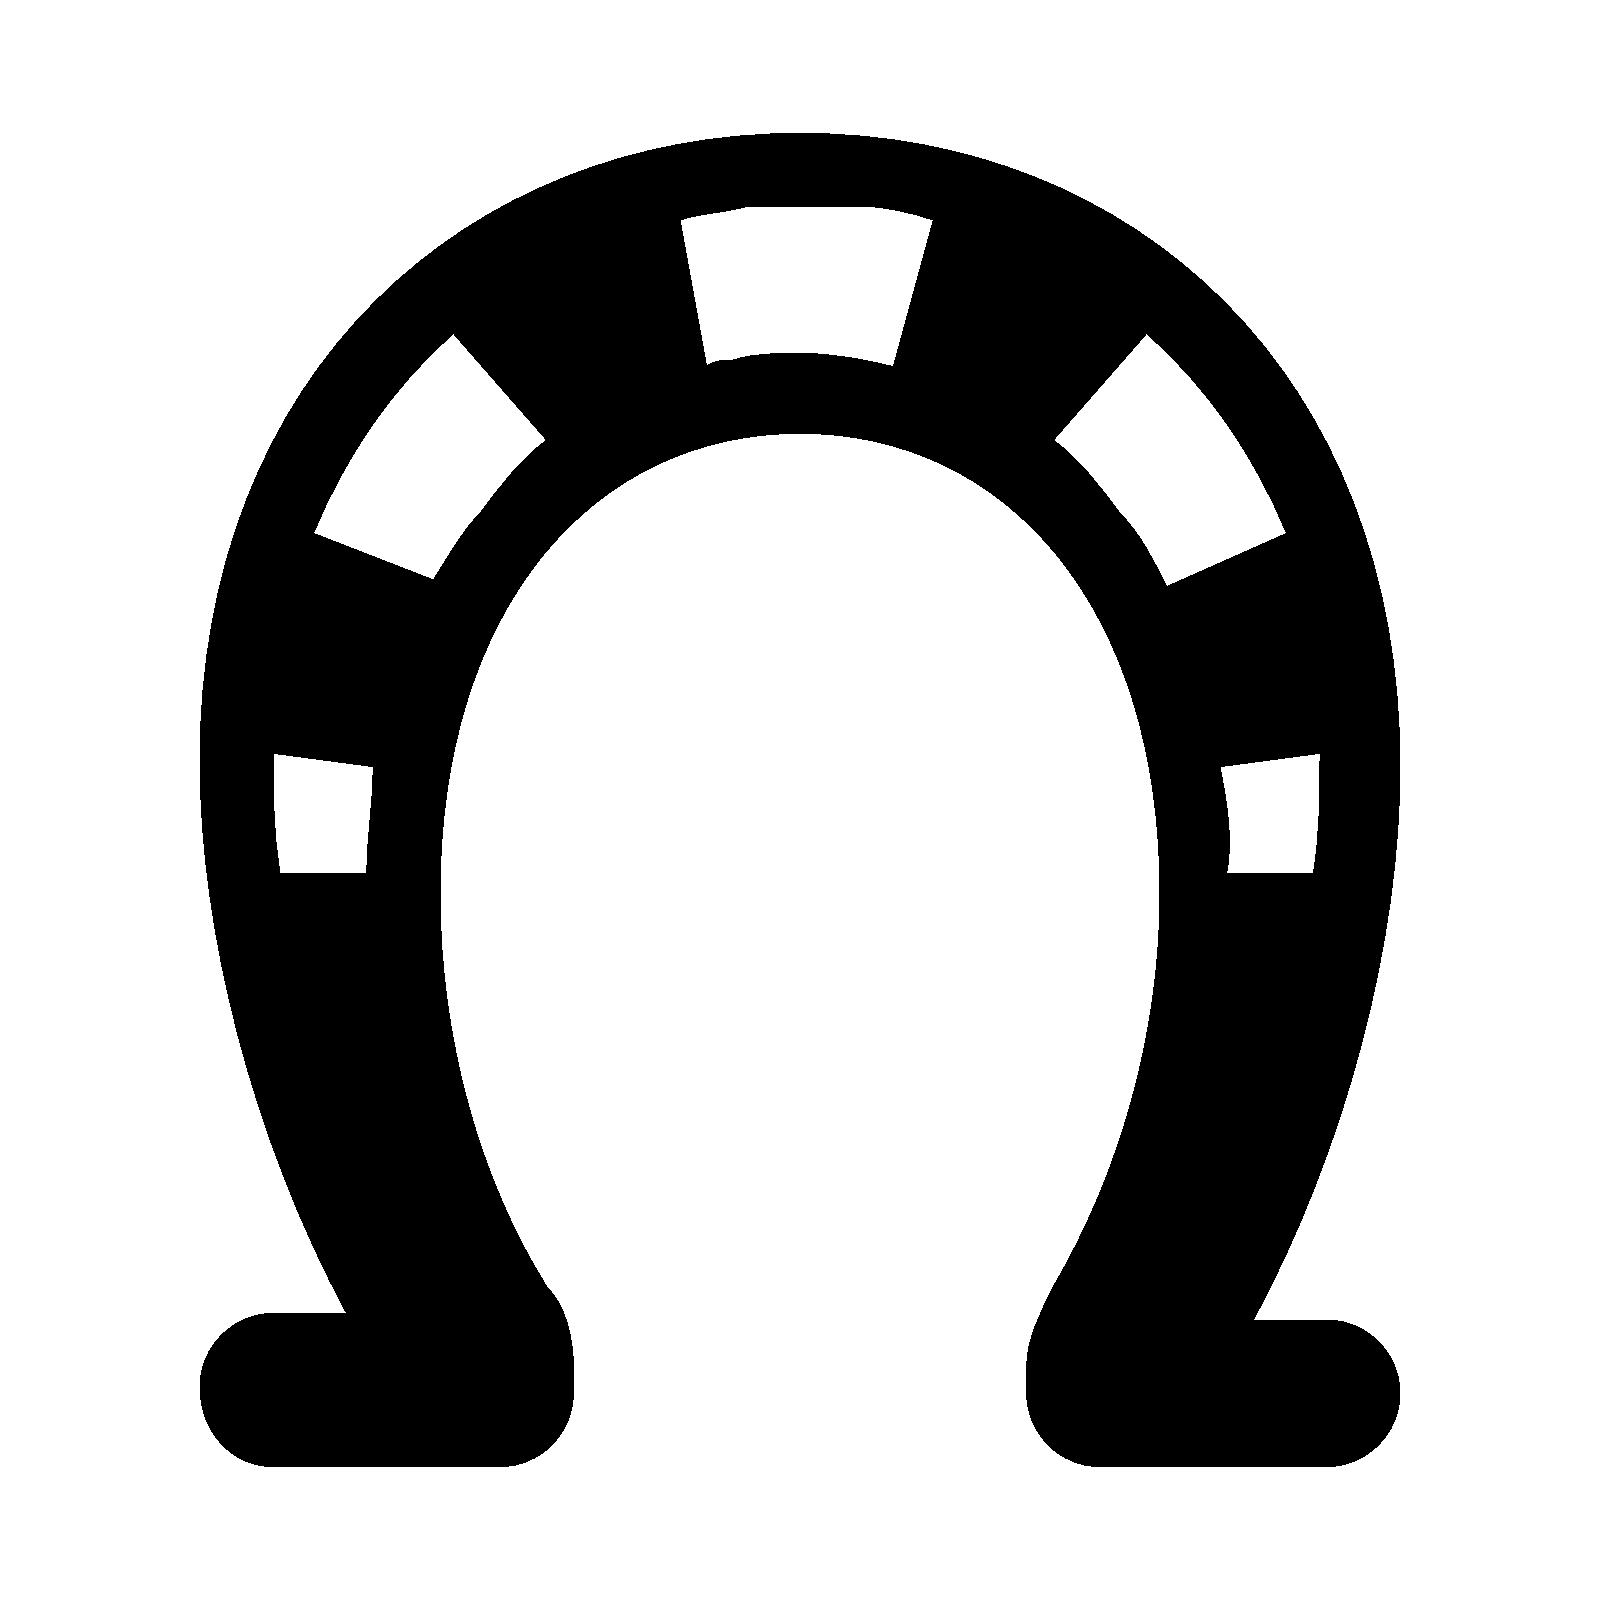 Clipart mustache horseshoe. Download hq png image